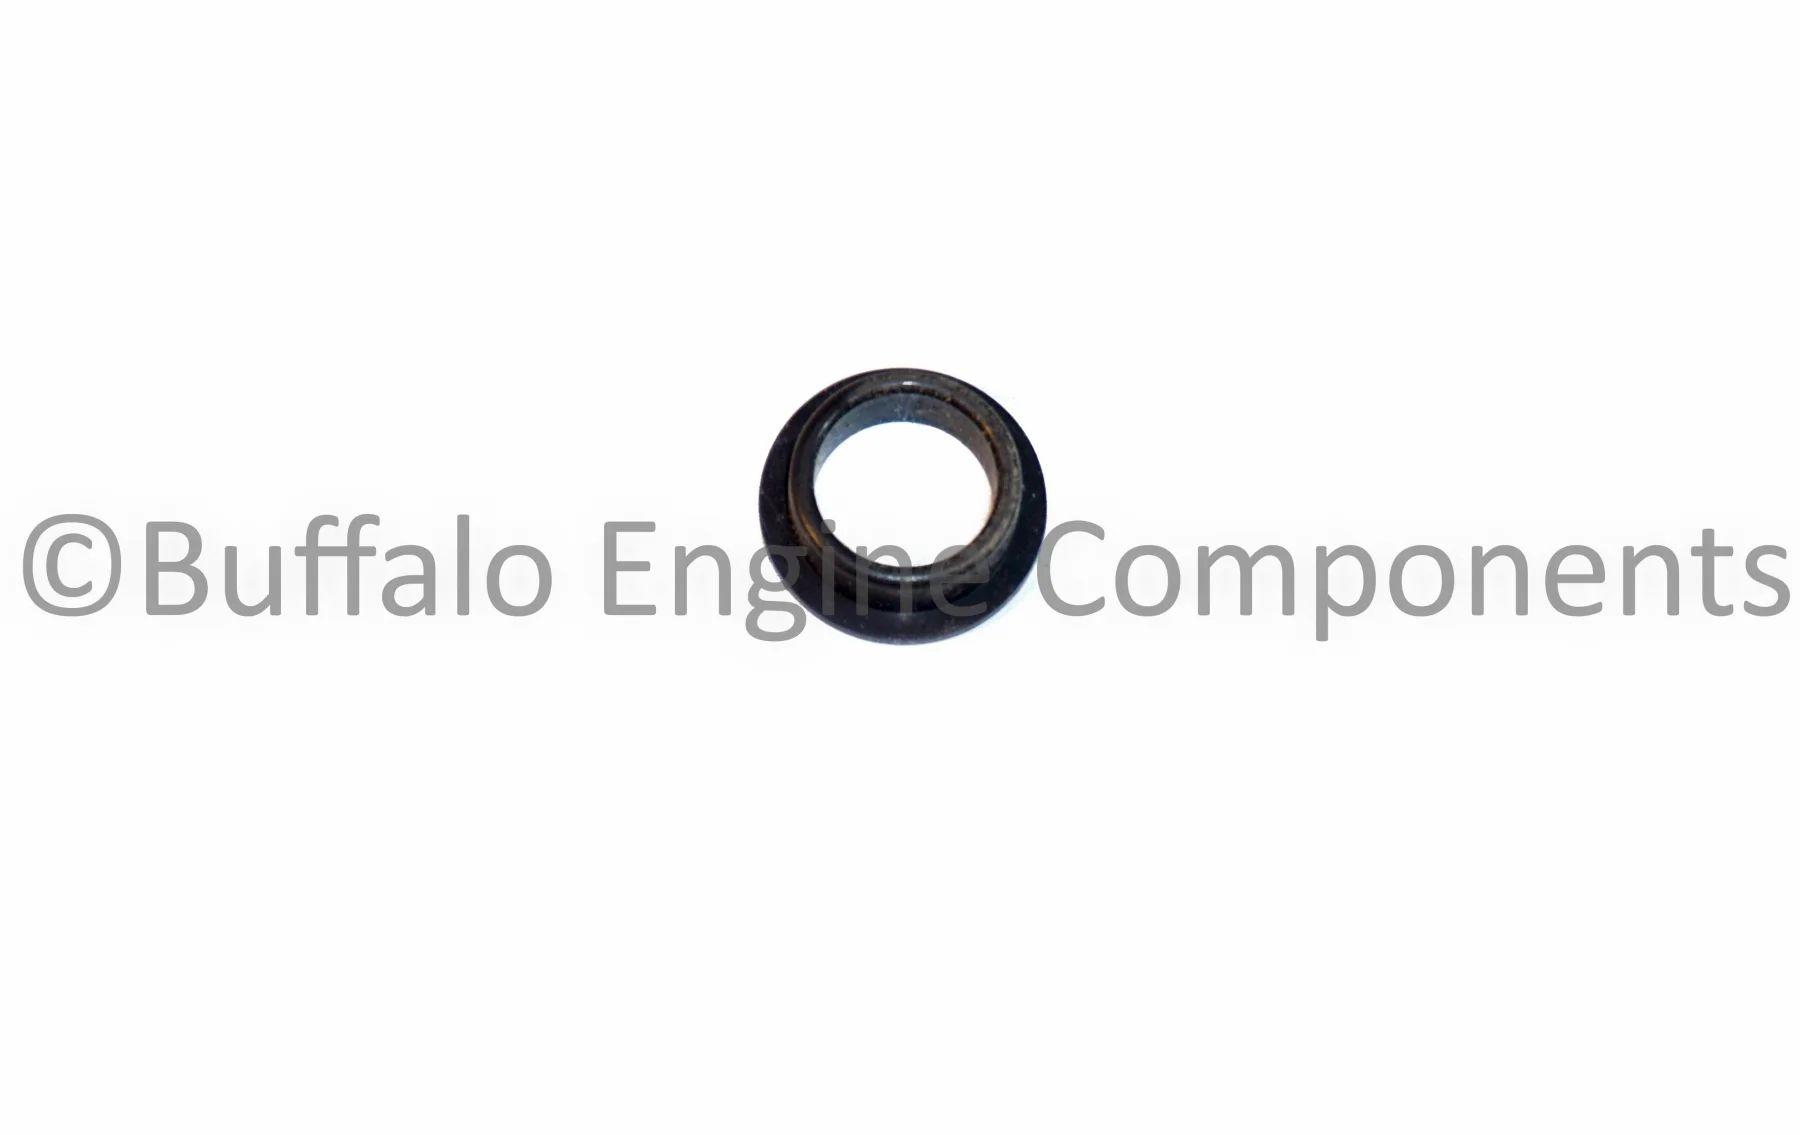 E40d Wiring Harness Repair Kit Auto Electrical Diagram 6t75 Transmission Rebuild